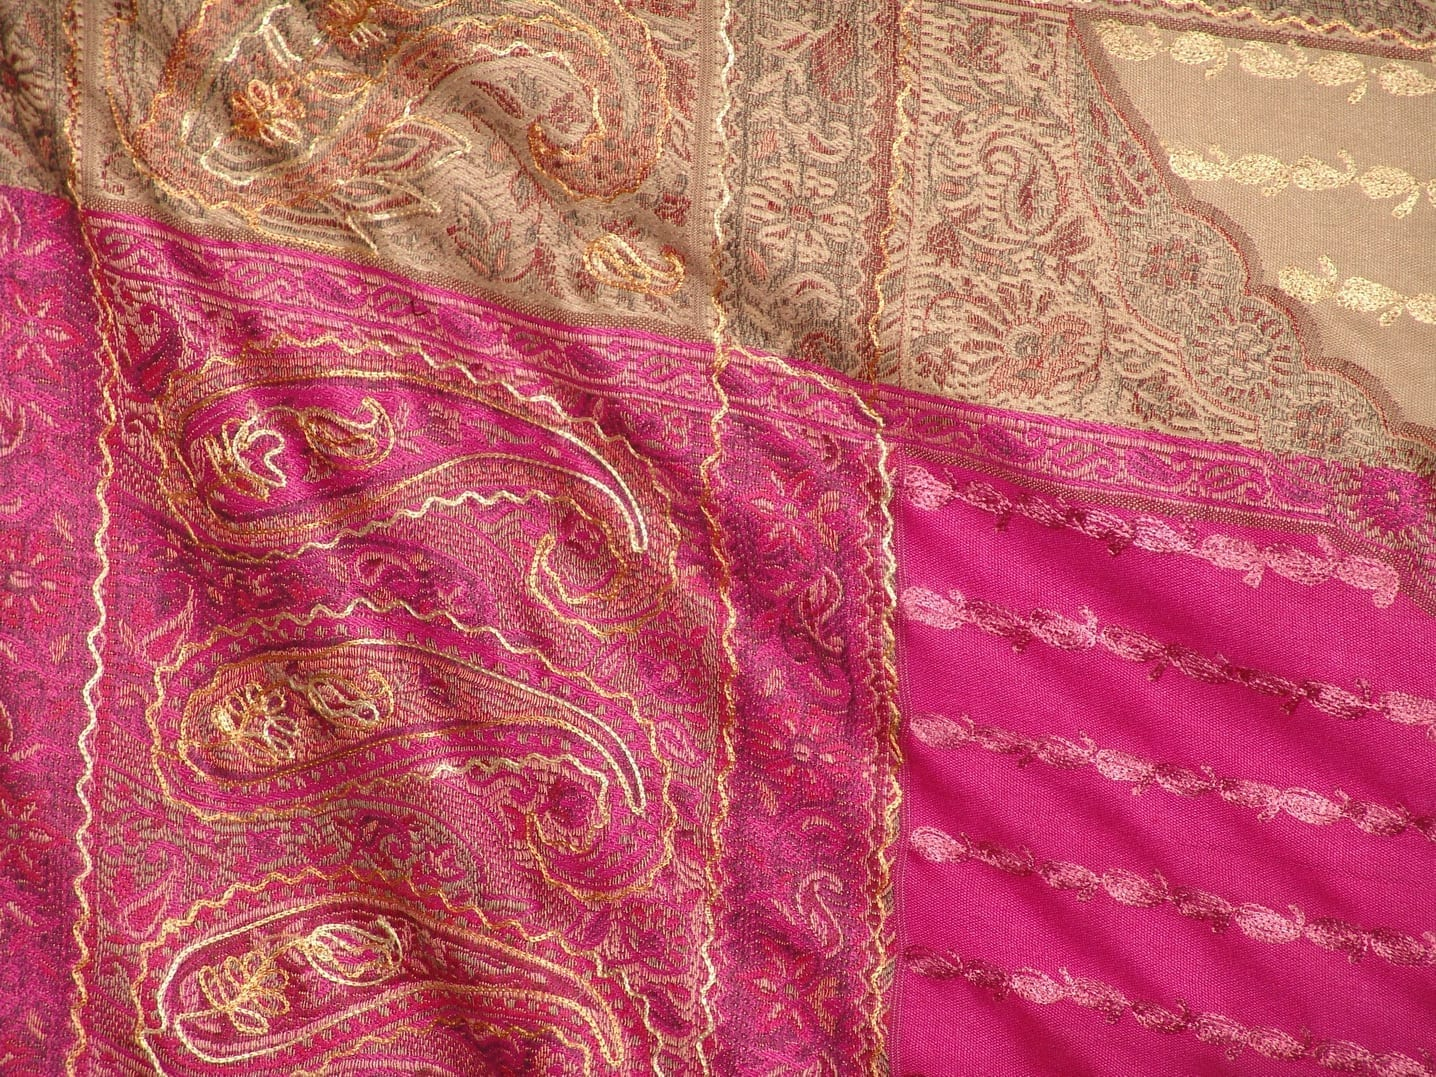 magenta thread embroidered Cashmere Stole C0233 3